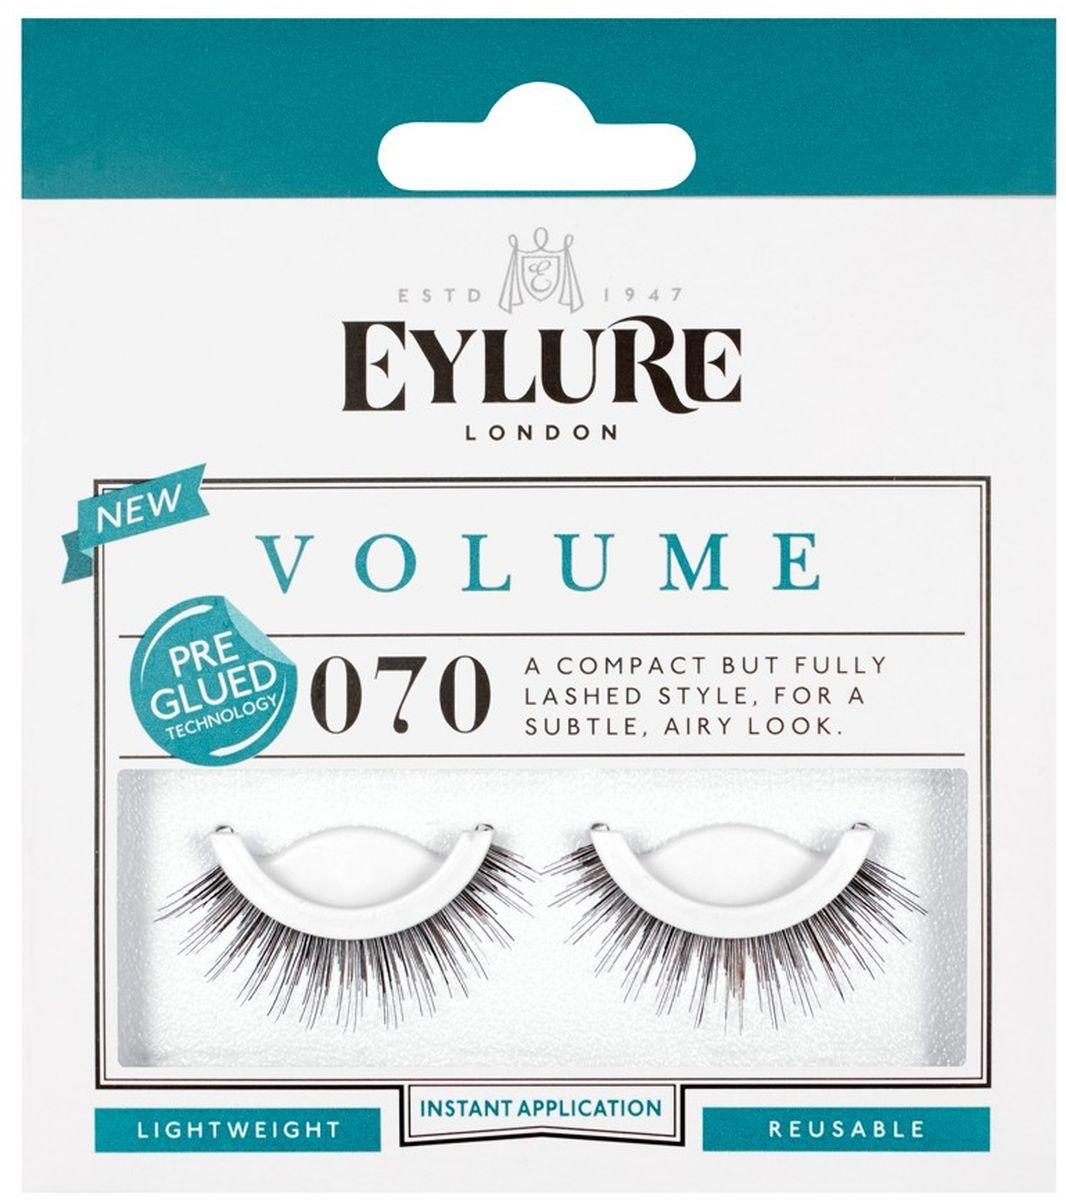 Eylure Накладные реницы объемные Volume Pre-Glued (с нанесенным клеем). 6006012